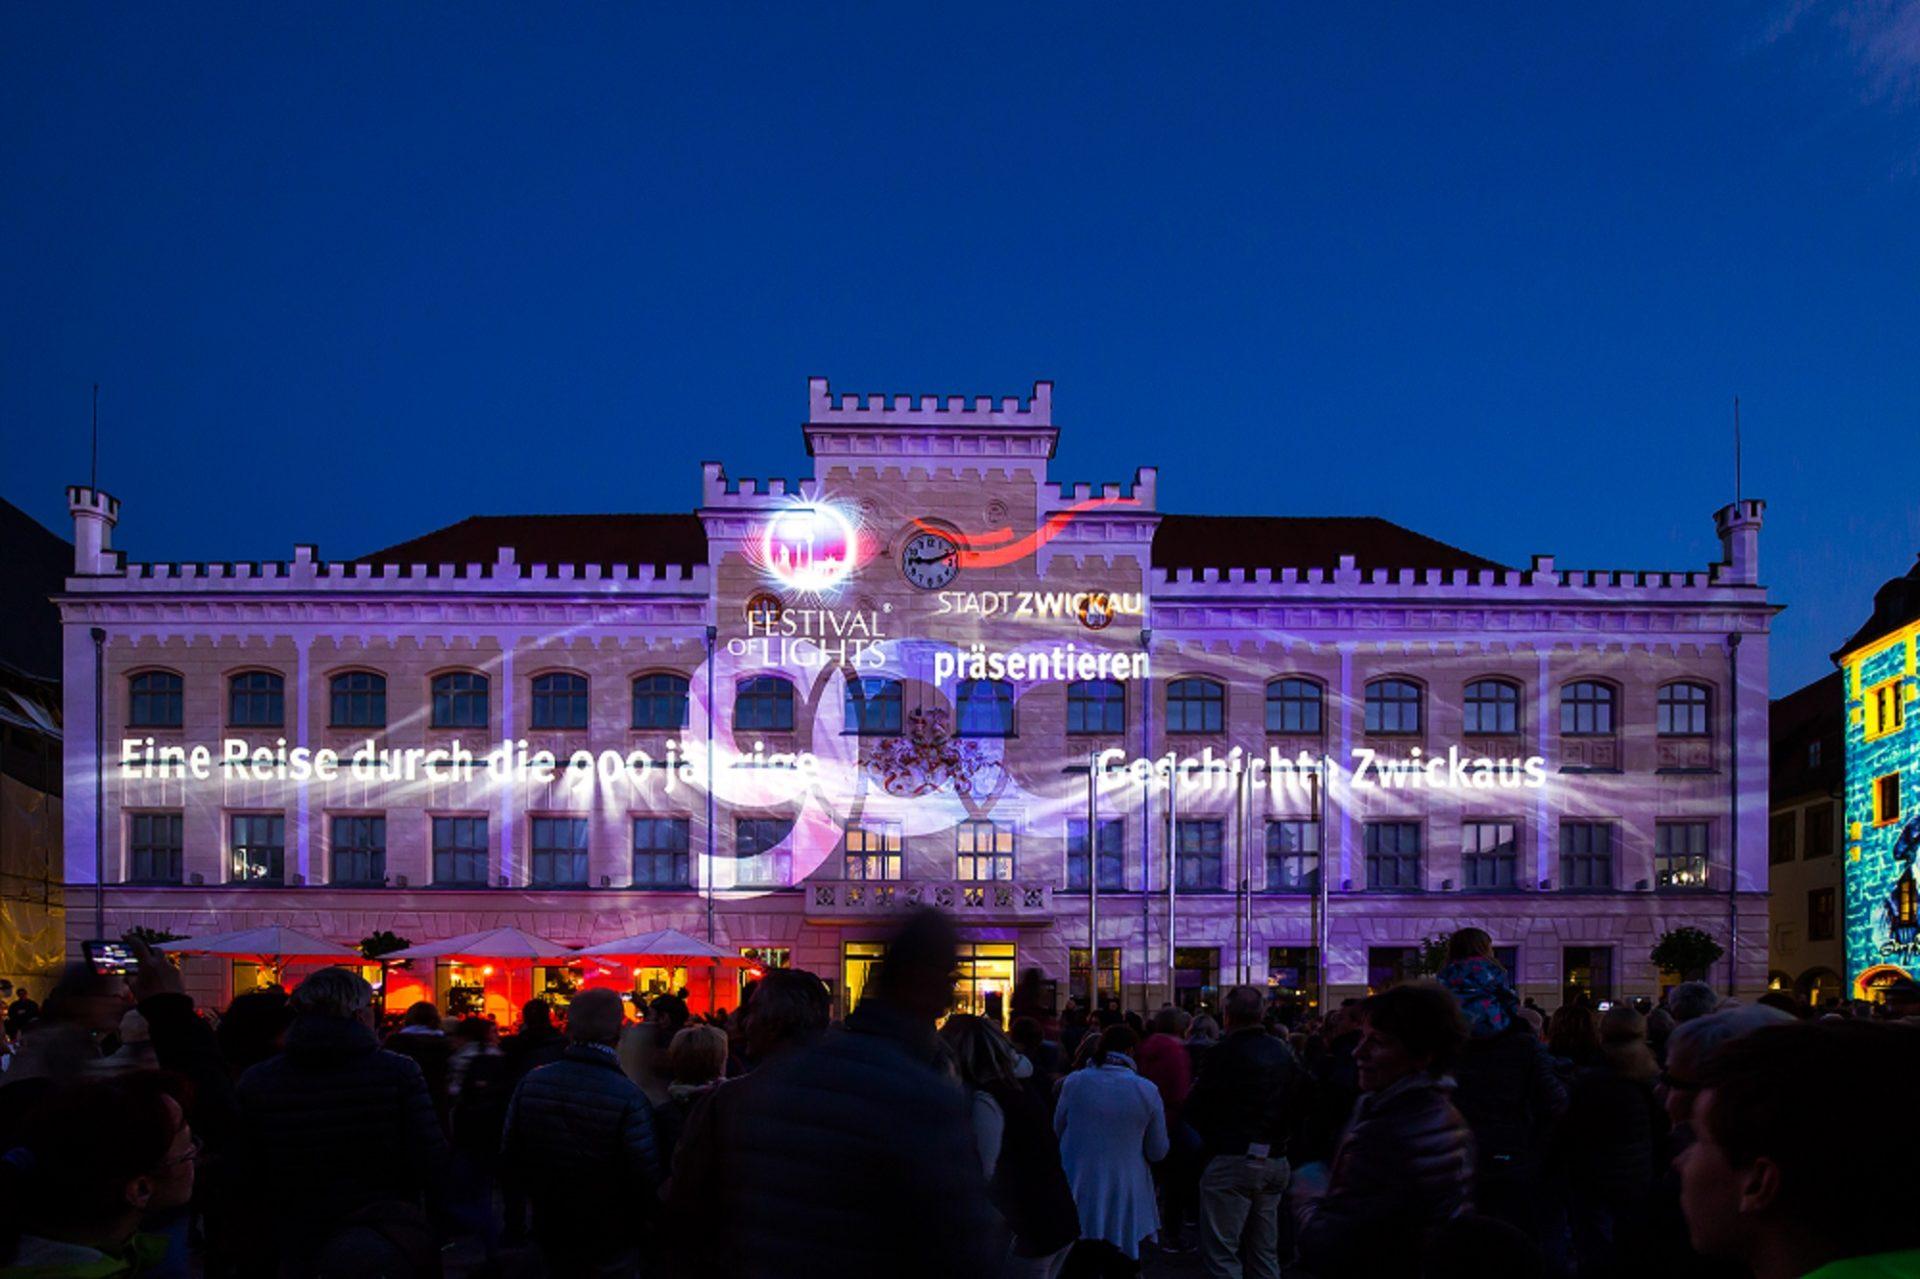 Rathaus Zwickau - Festival of Lights in Zwickau - 2018